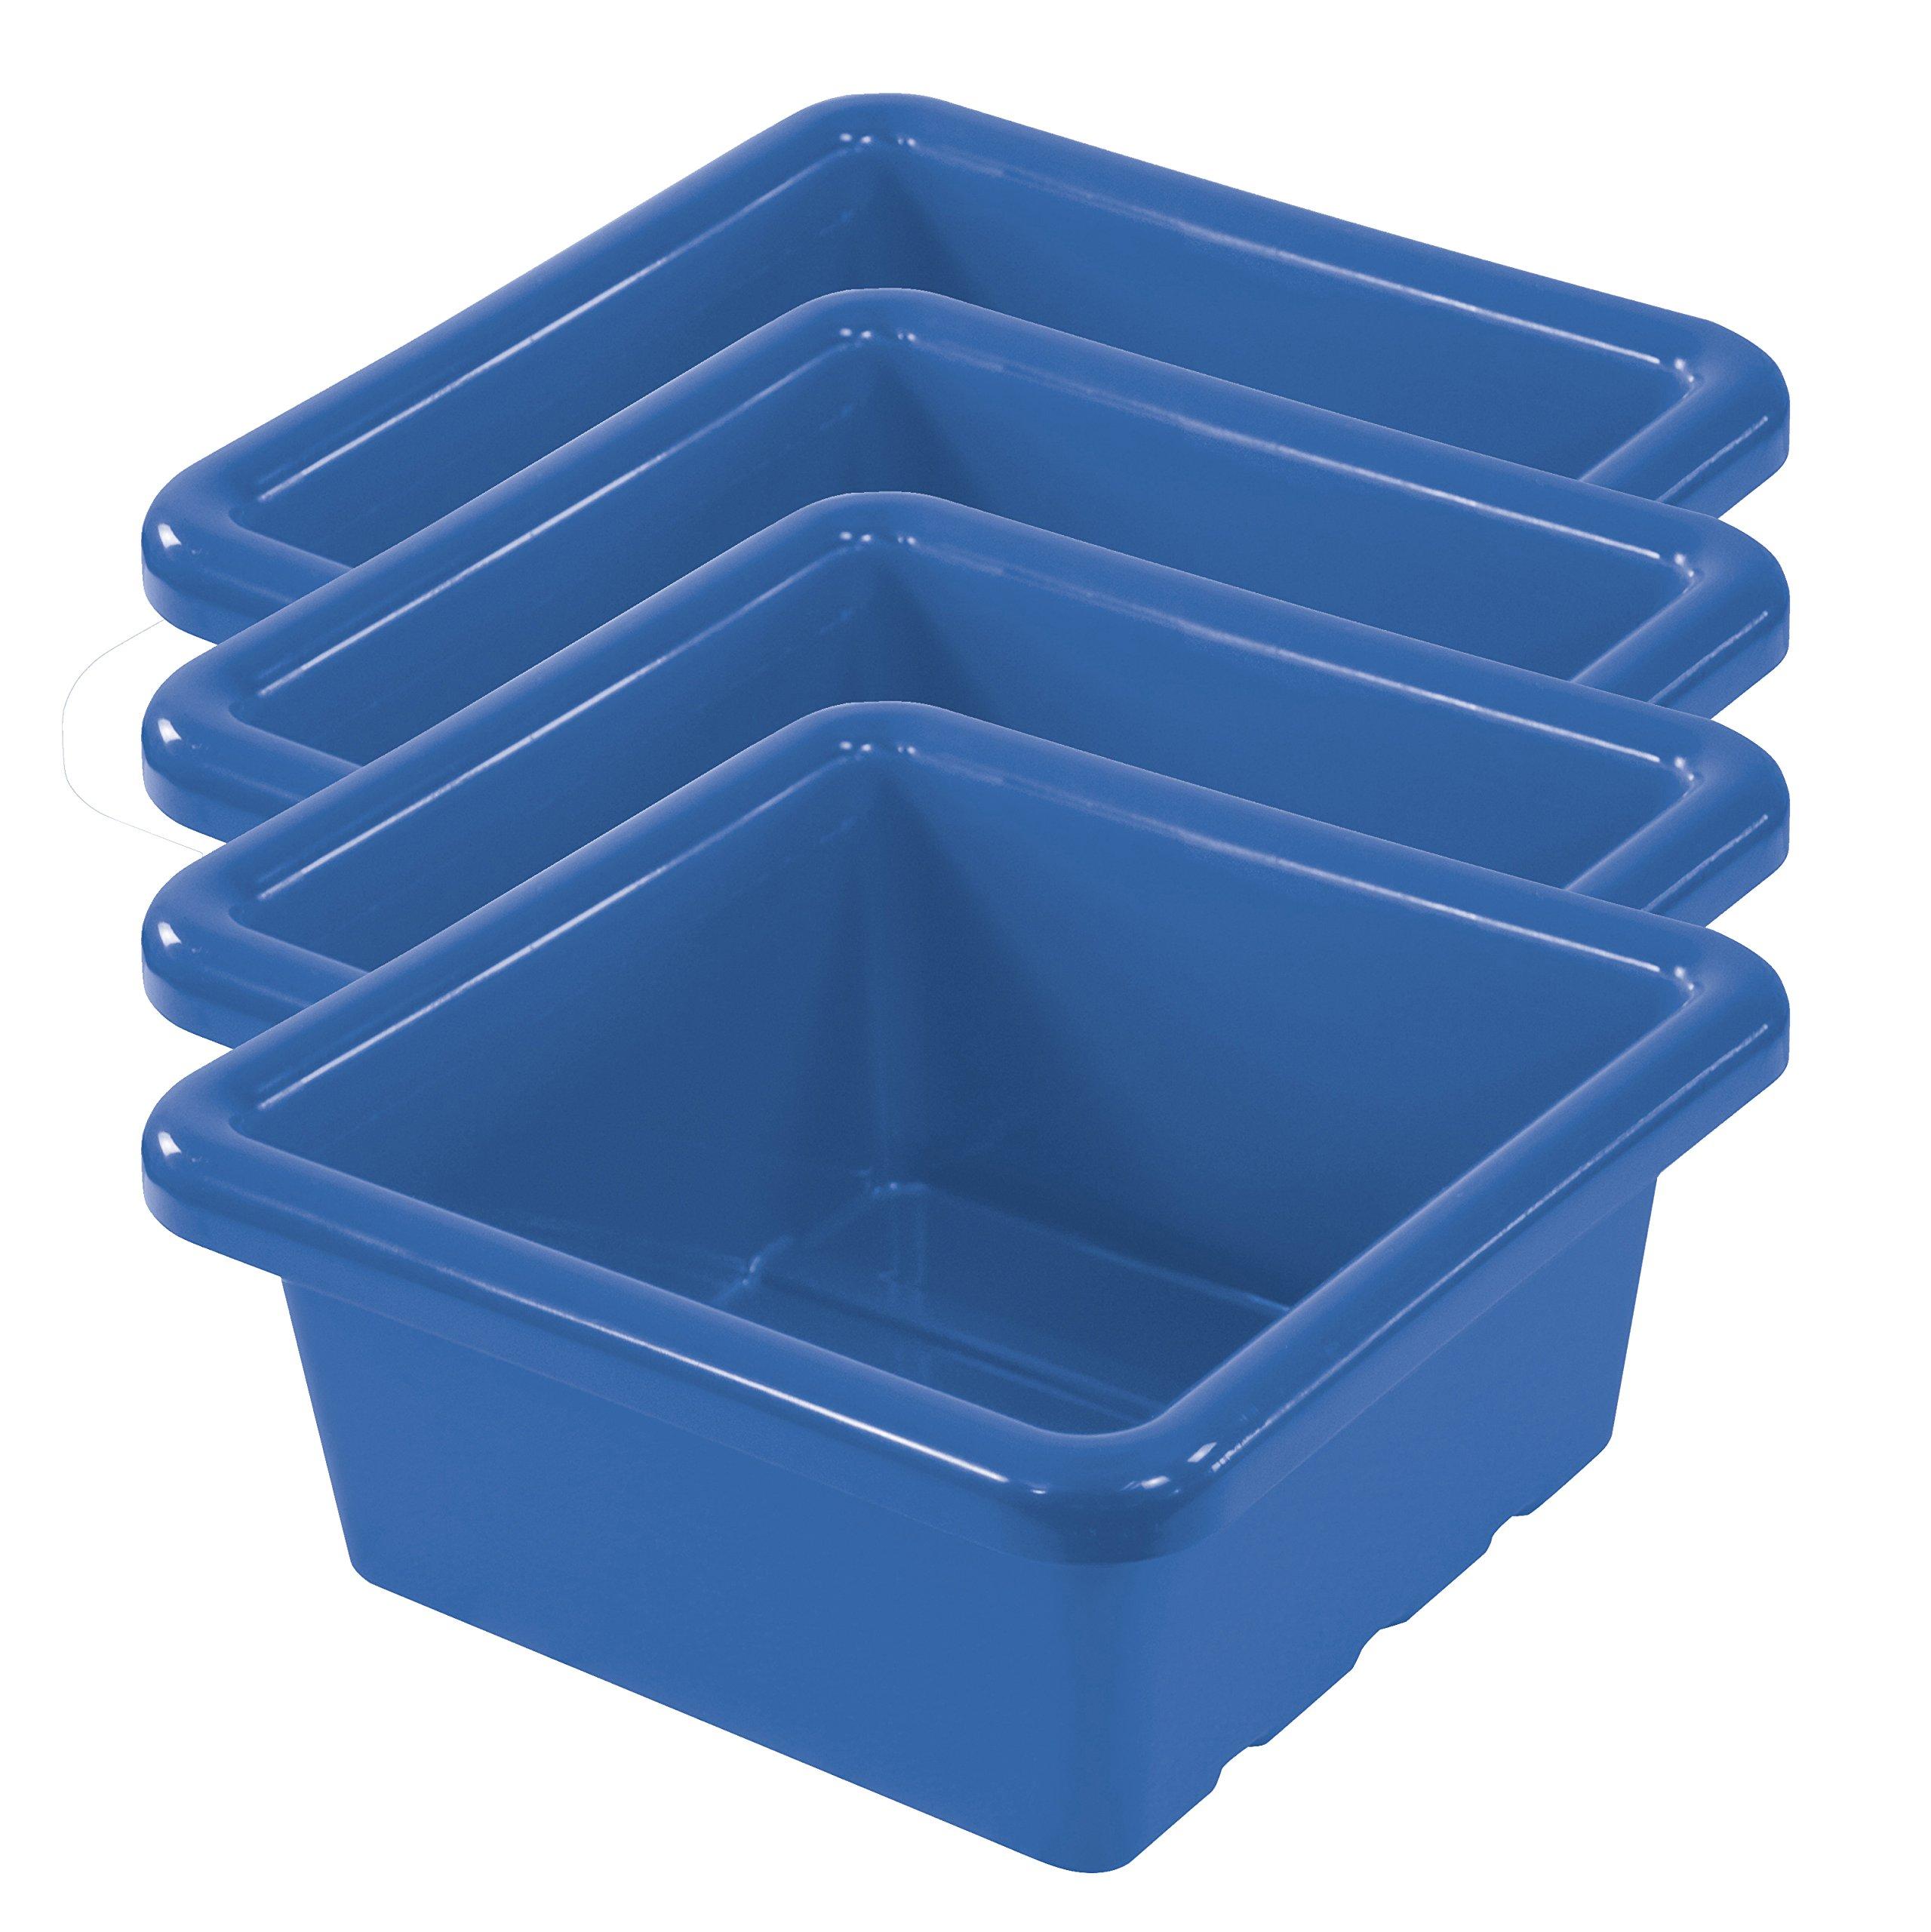 ECR4Kids Square Storage Tray, Blue (4-Pack)